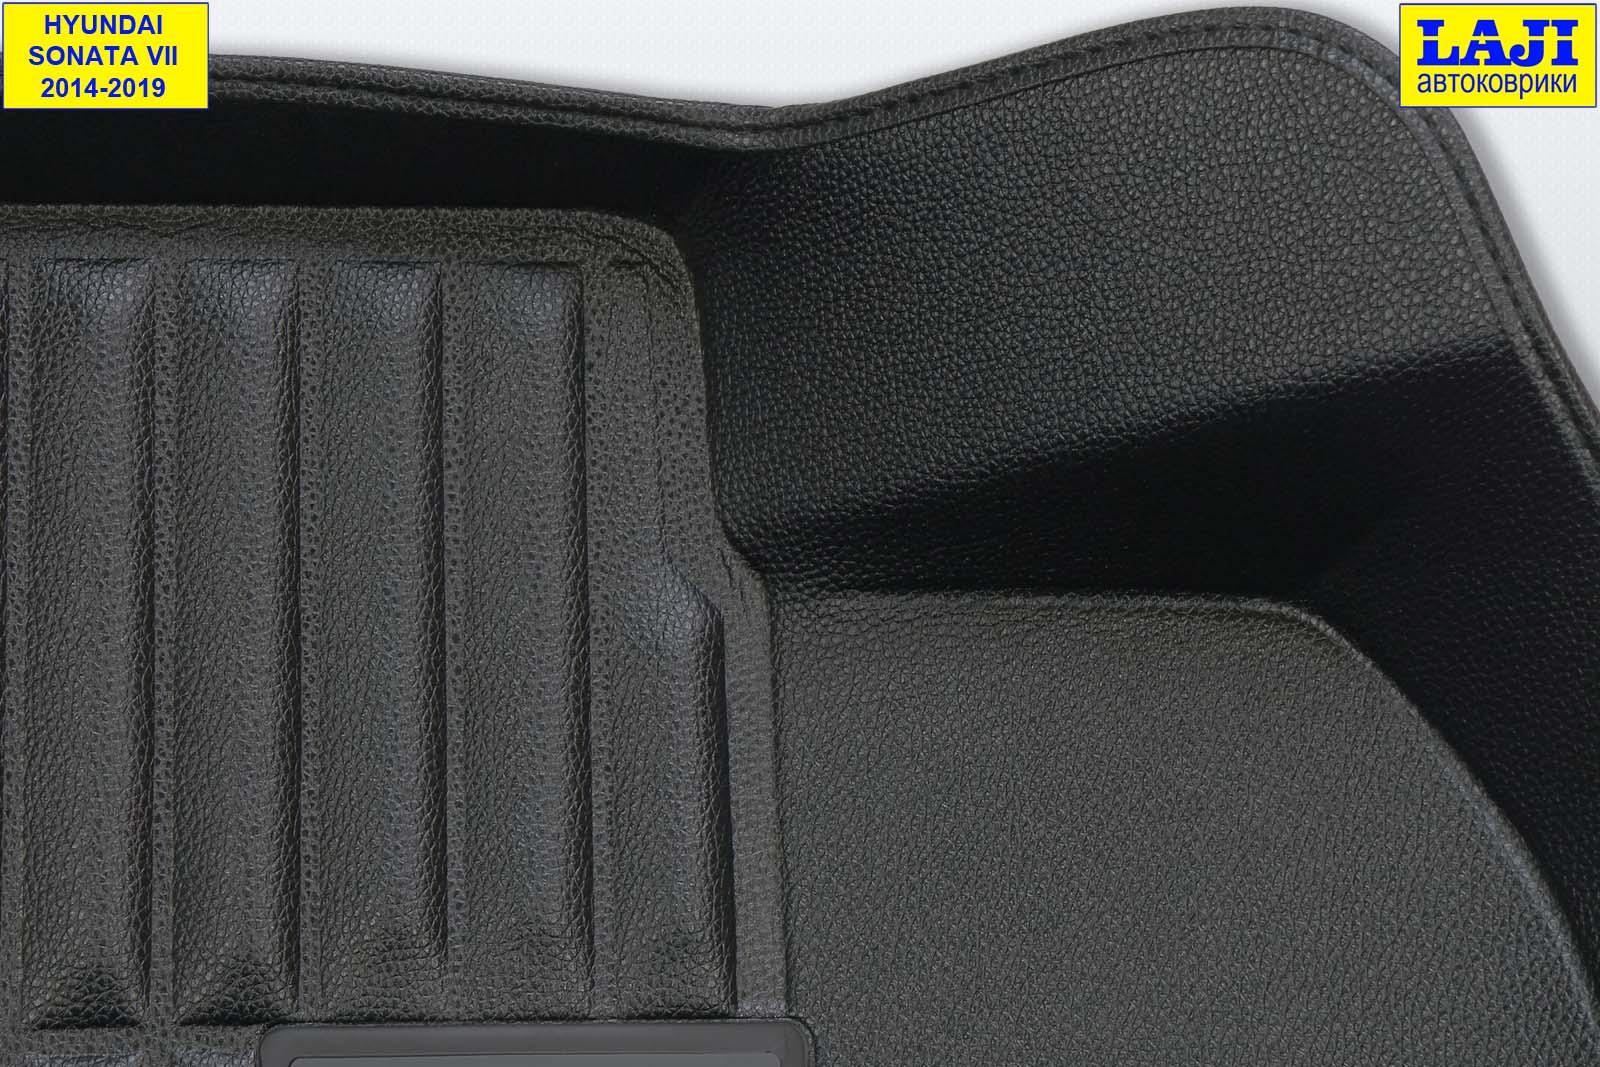 5D коврики в салон Hyundai Sonata 7 2014-2019 6